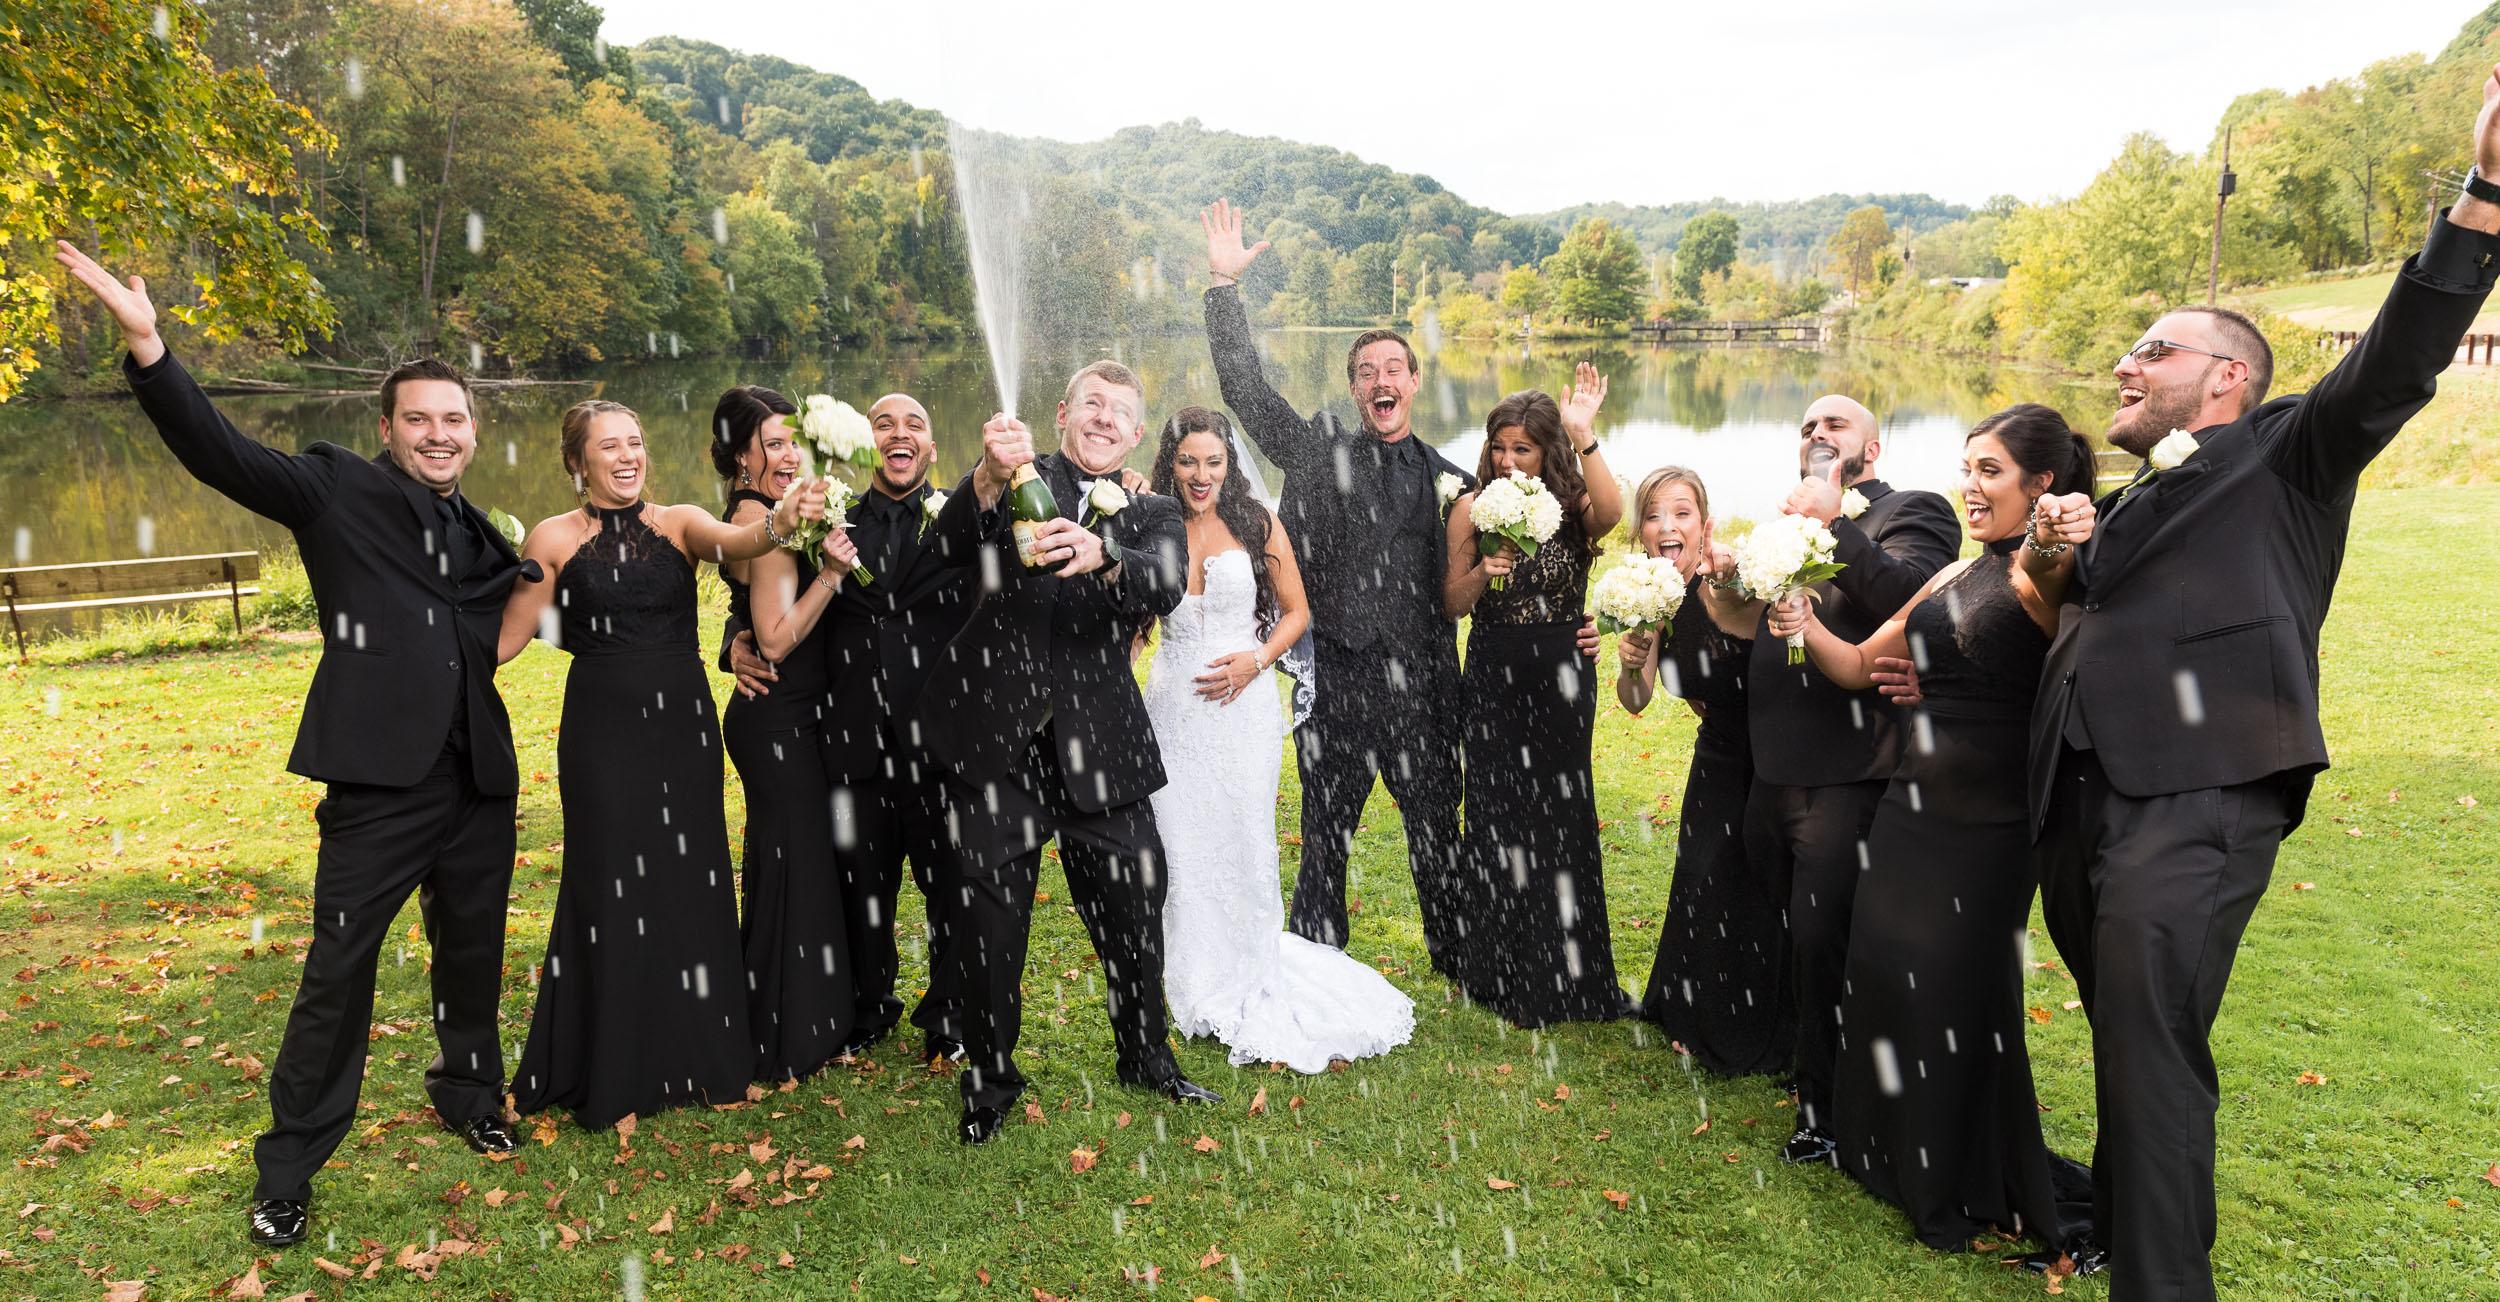 Wedding-Party-Champagne blast-1.jpg